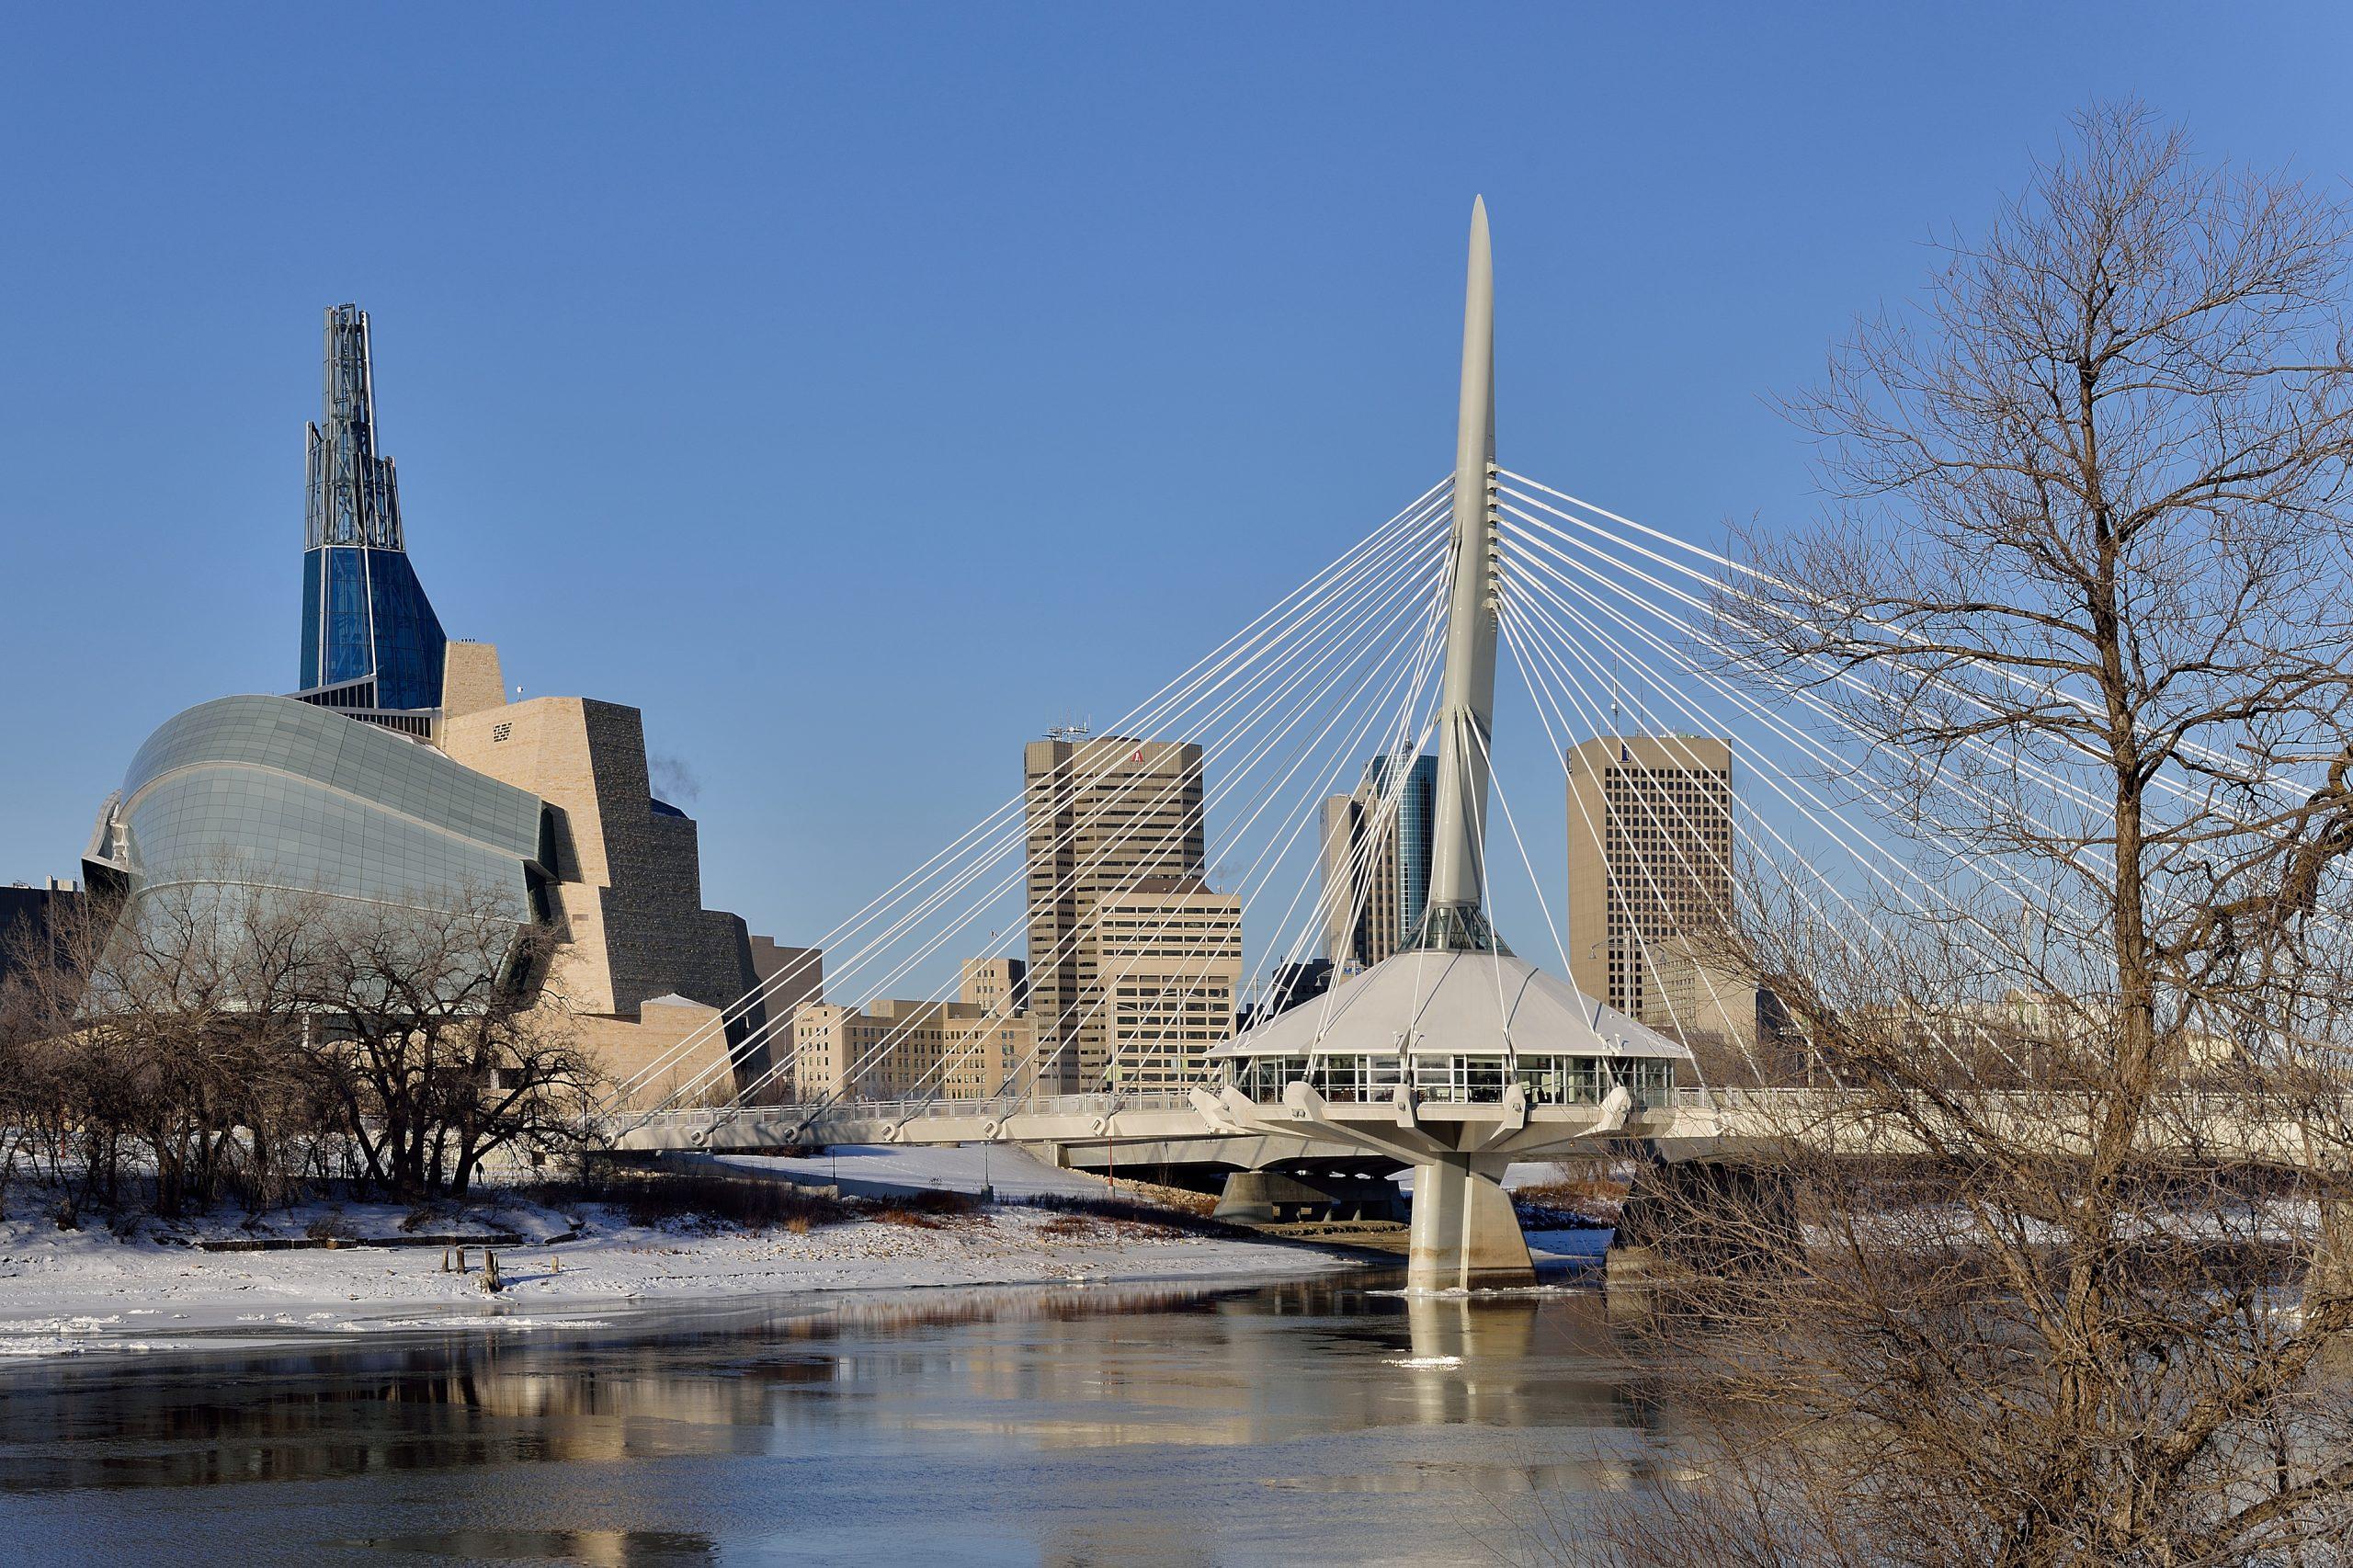 Landscape featuring the skyline from Winnipeg, Manitoba.